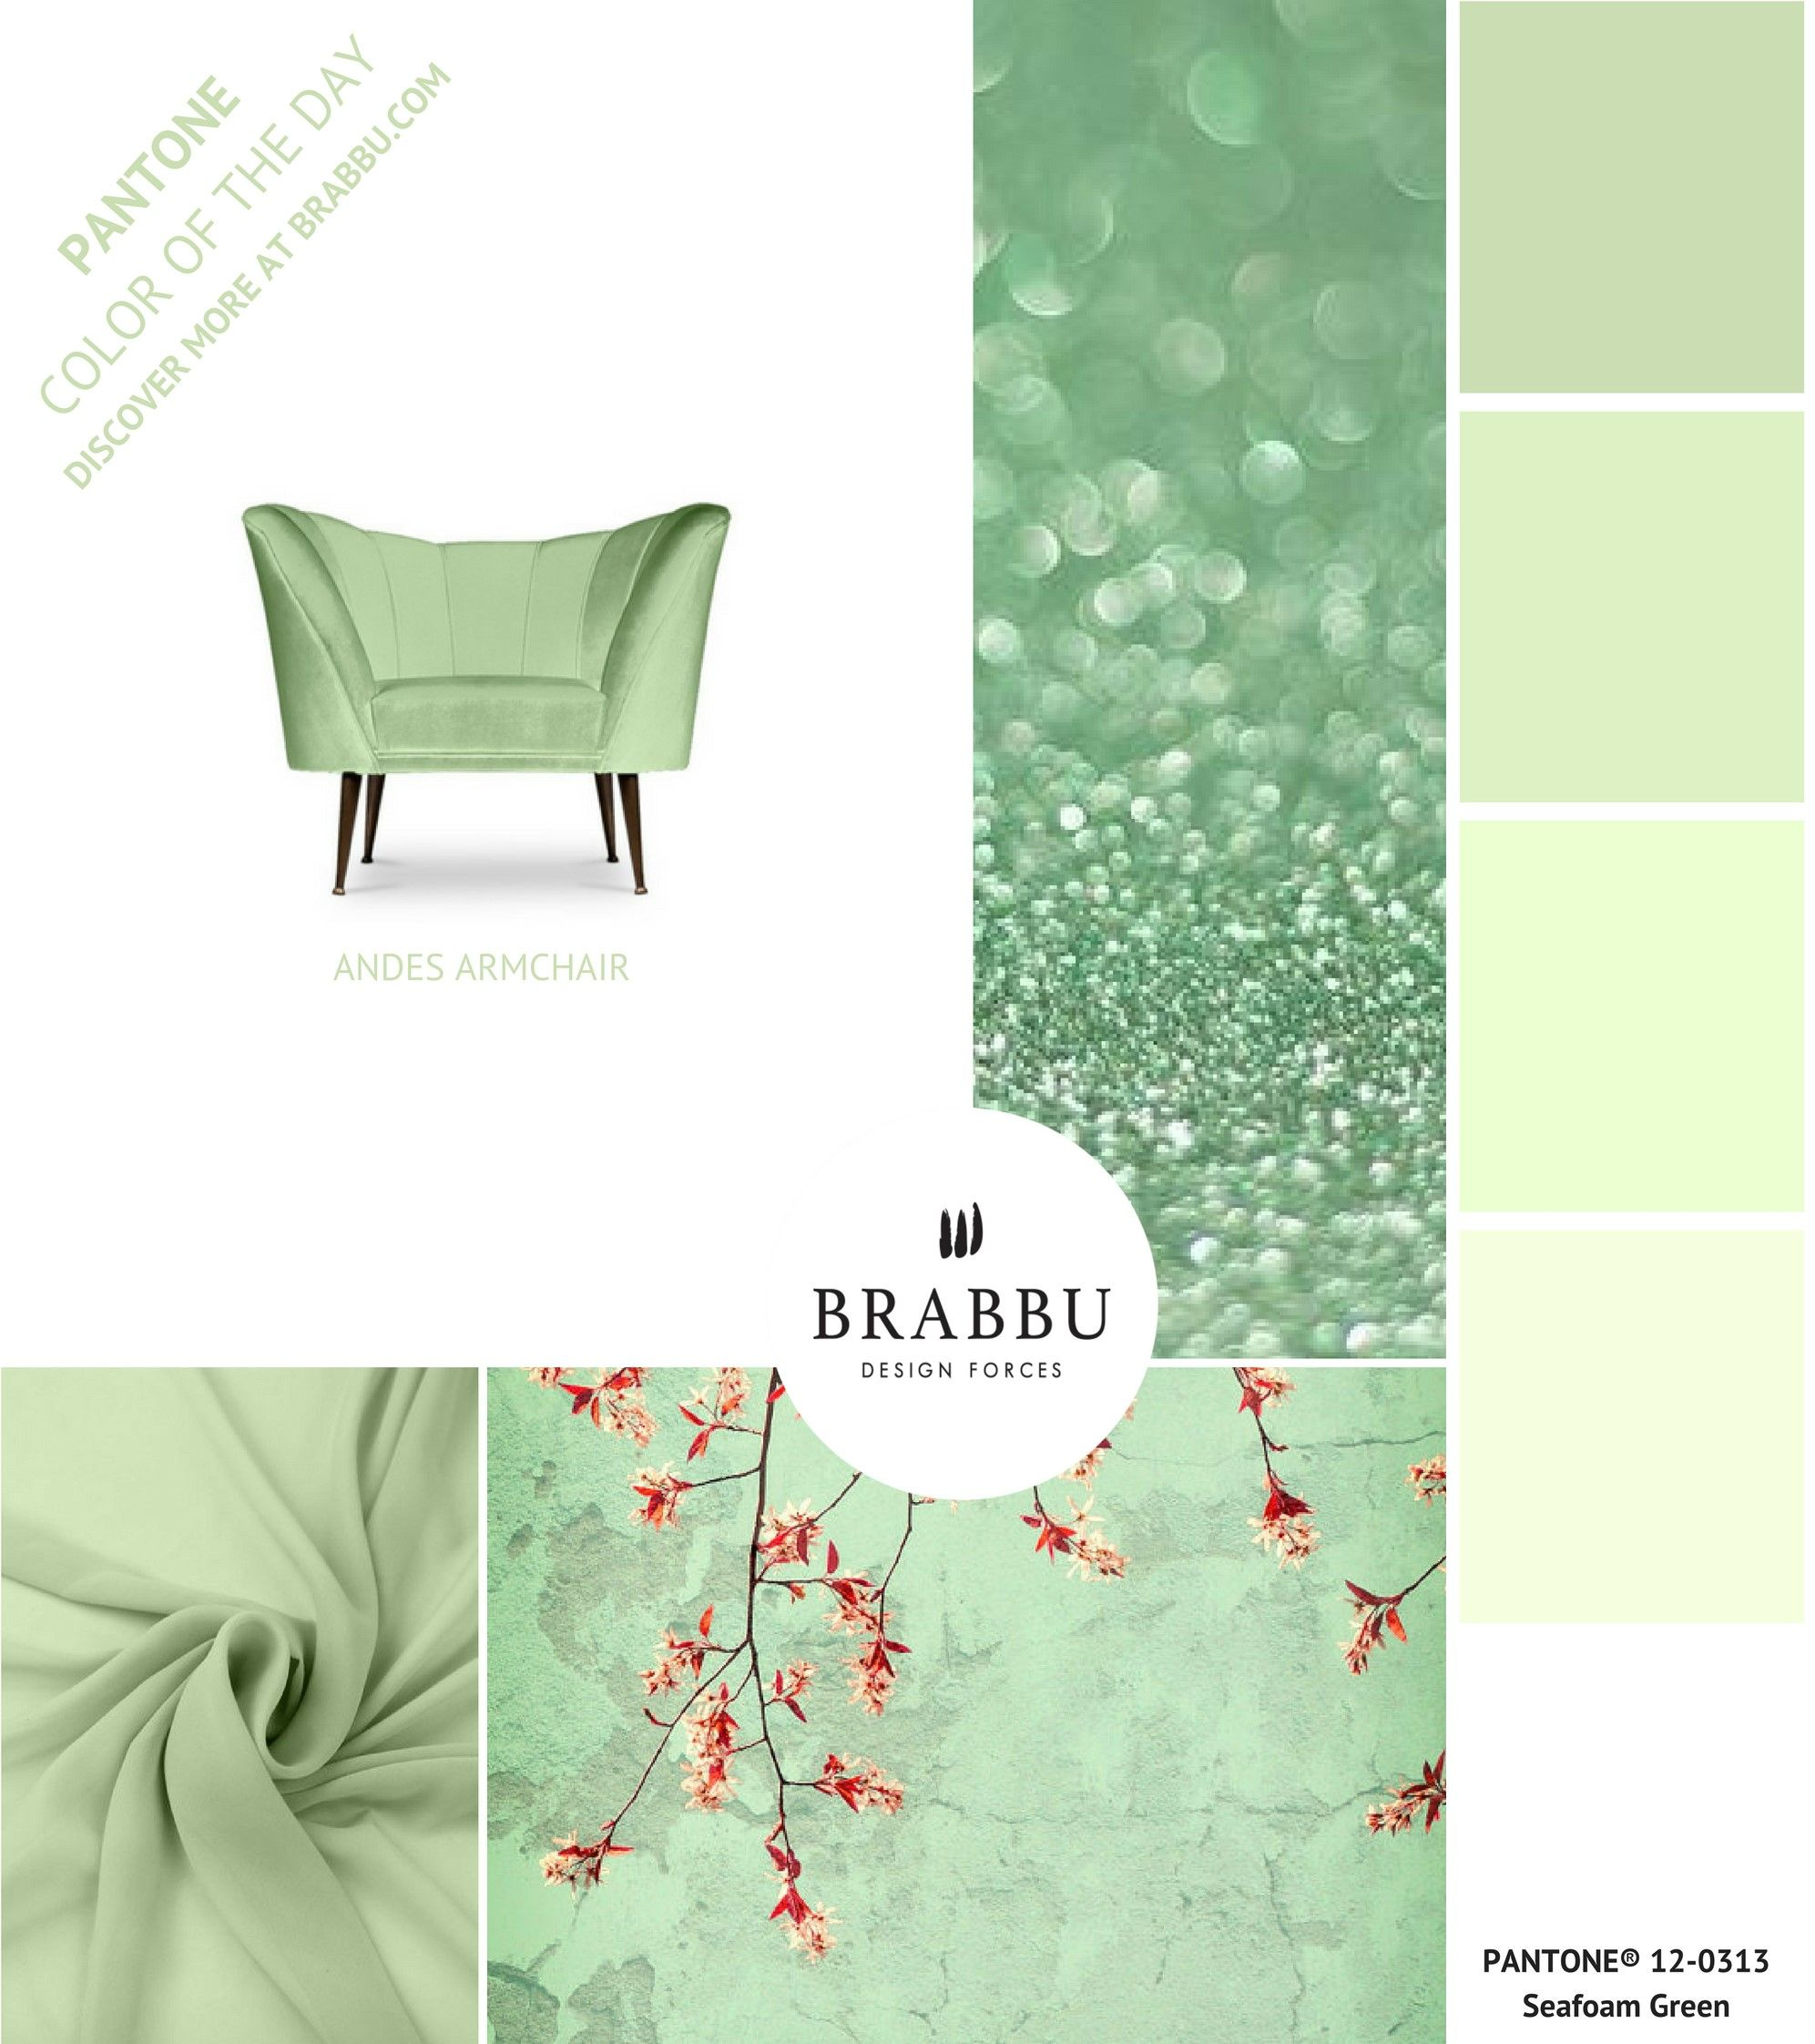 Punch Interior Design Furniture Options ~ Brabbu leading trends find here the best interior design